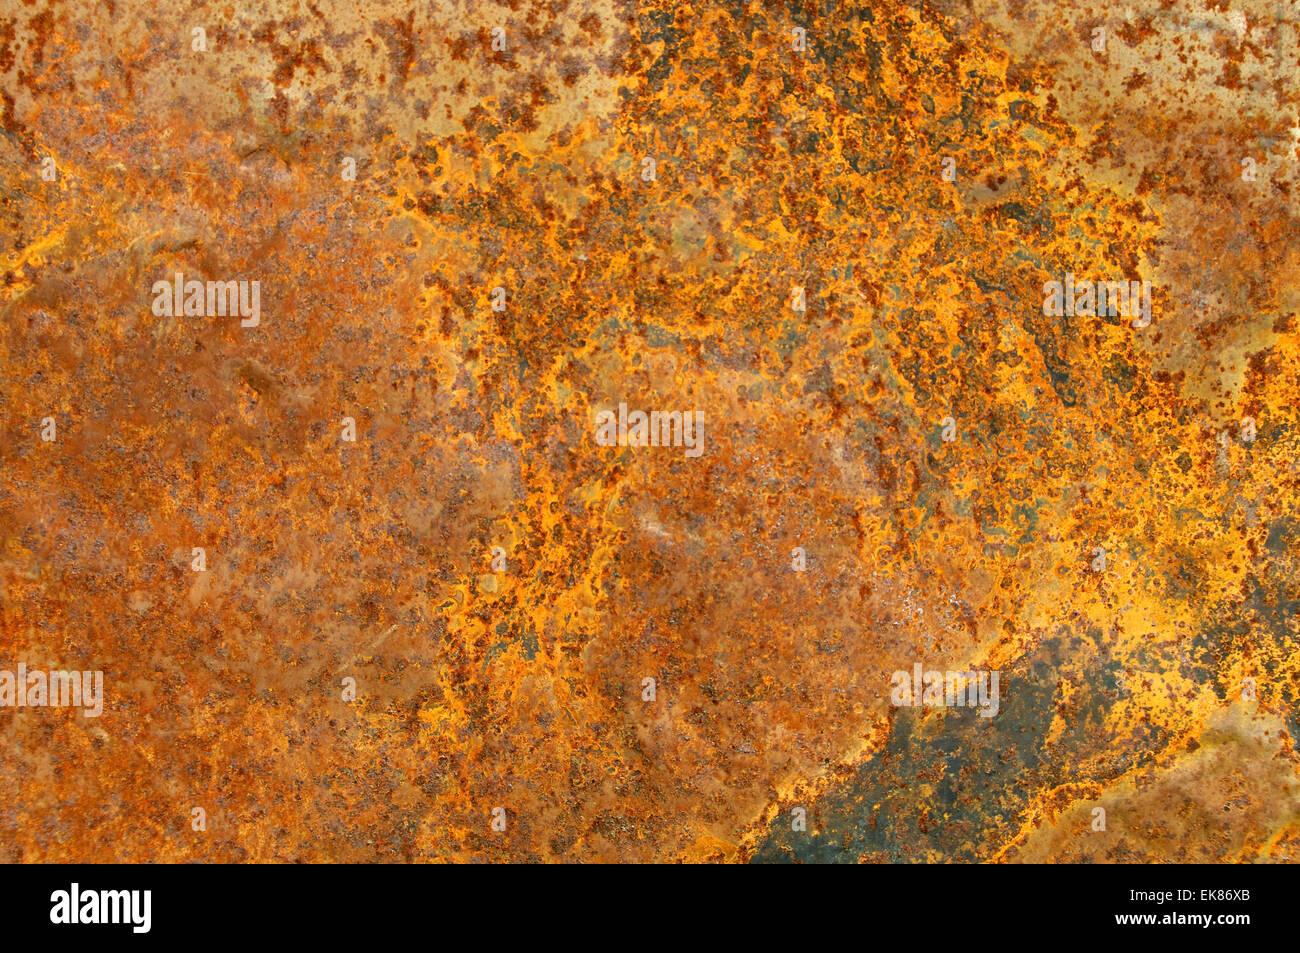 Kupfer Rost copper rust stockfotos copper rust bilder alamy